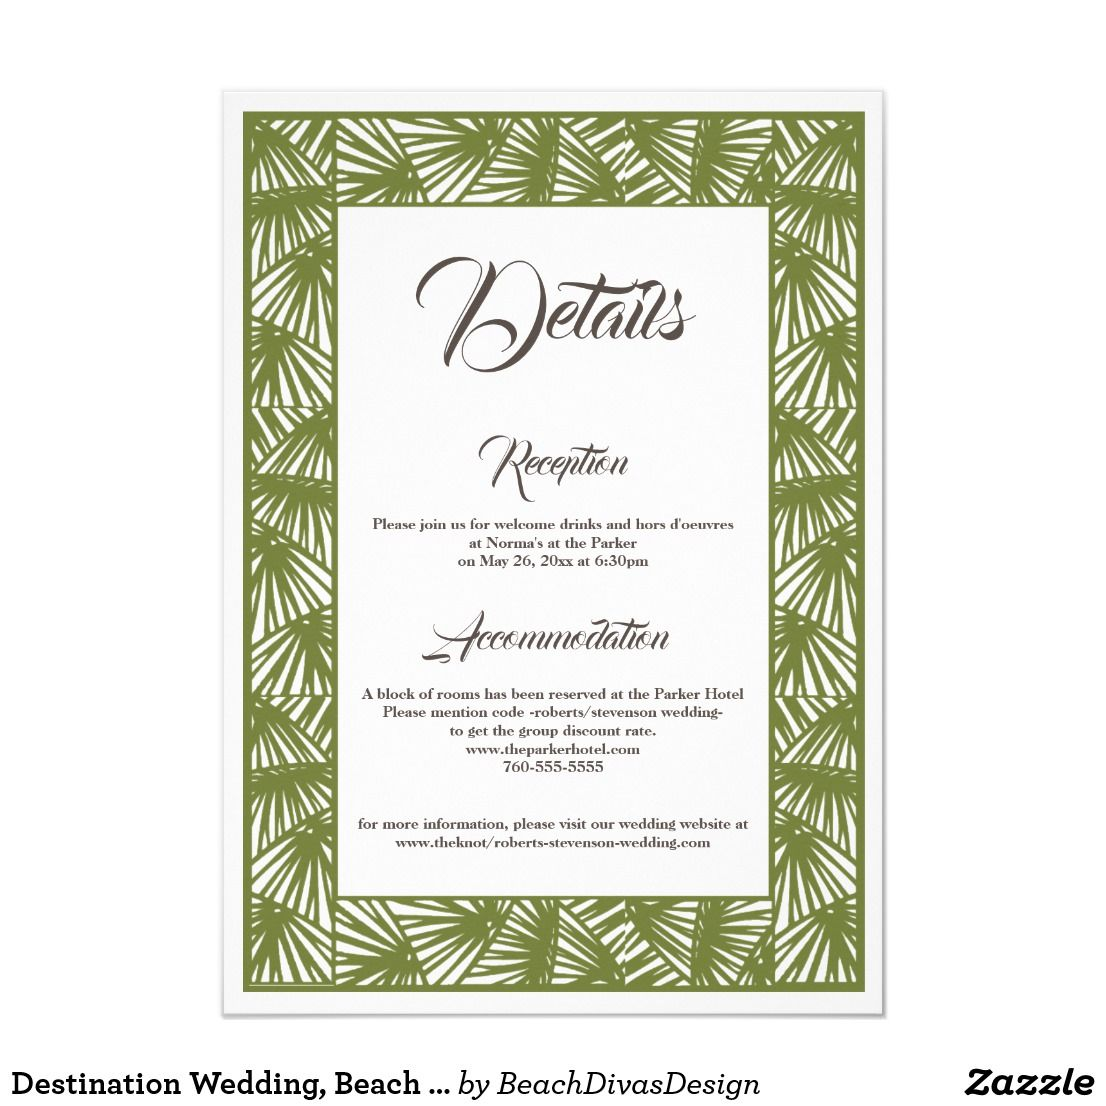 Destination Wedding Beach Wedding Details Card Zazzle Com Wedding Details Card Destination Wedding Beach Wedding